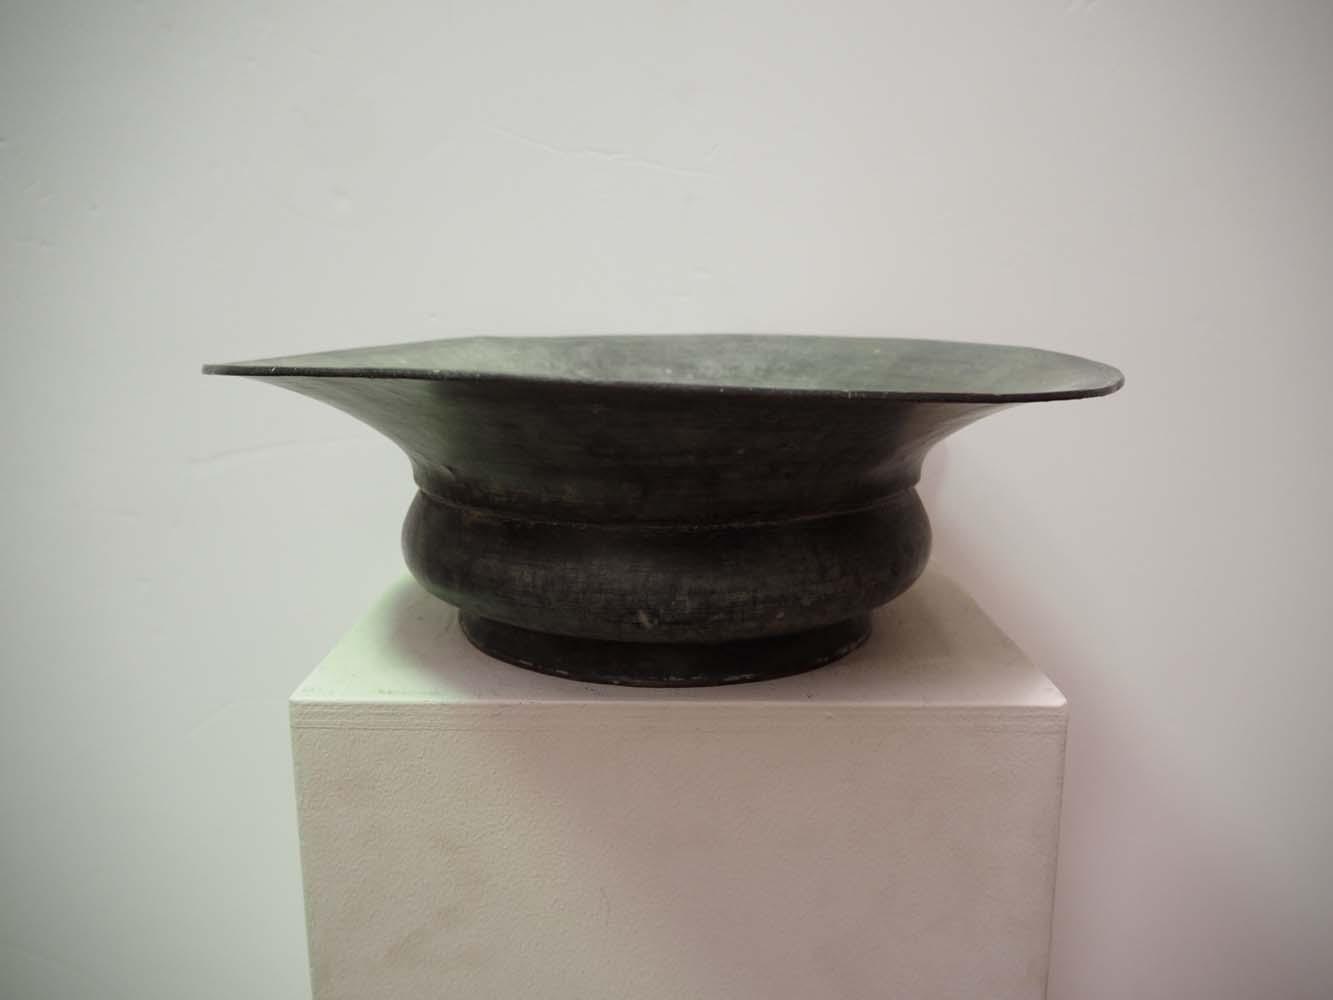 Antique Ottoman metal work homeware tinnec copper engraved bowl